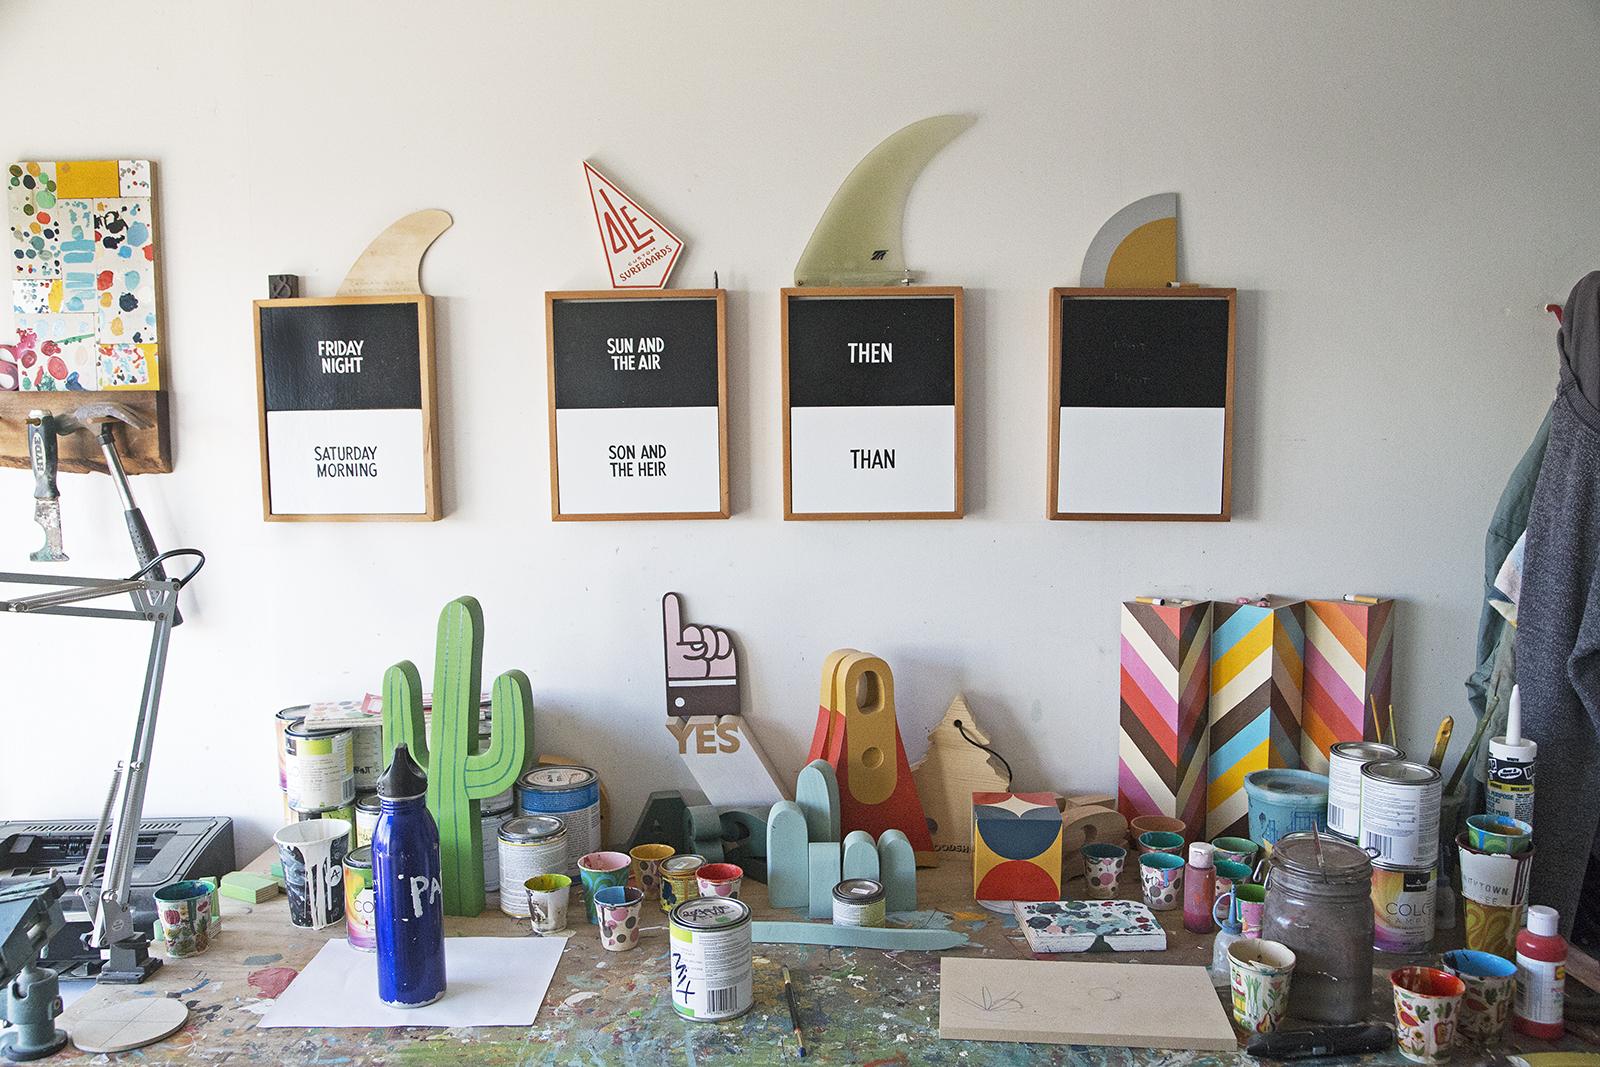 Jeff Canham studio in San Francisco